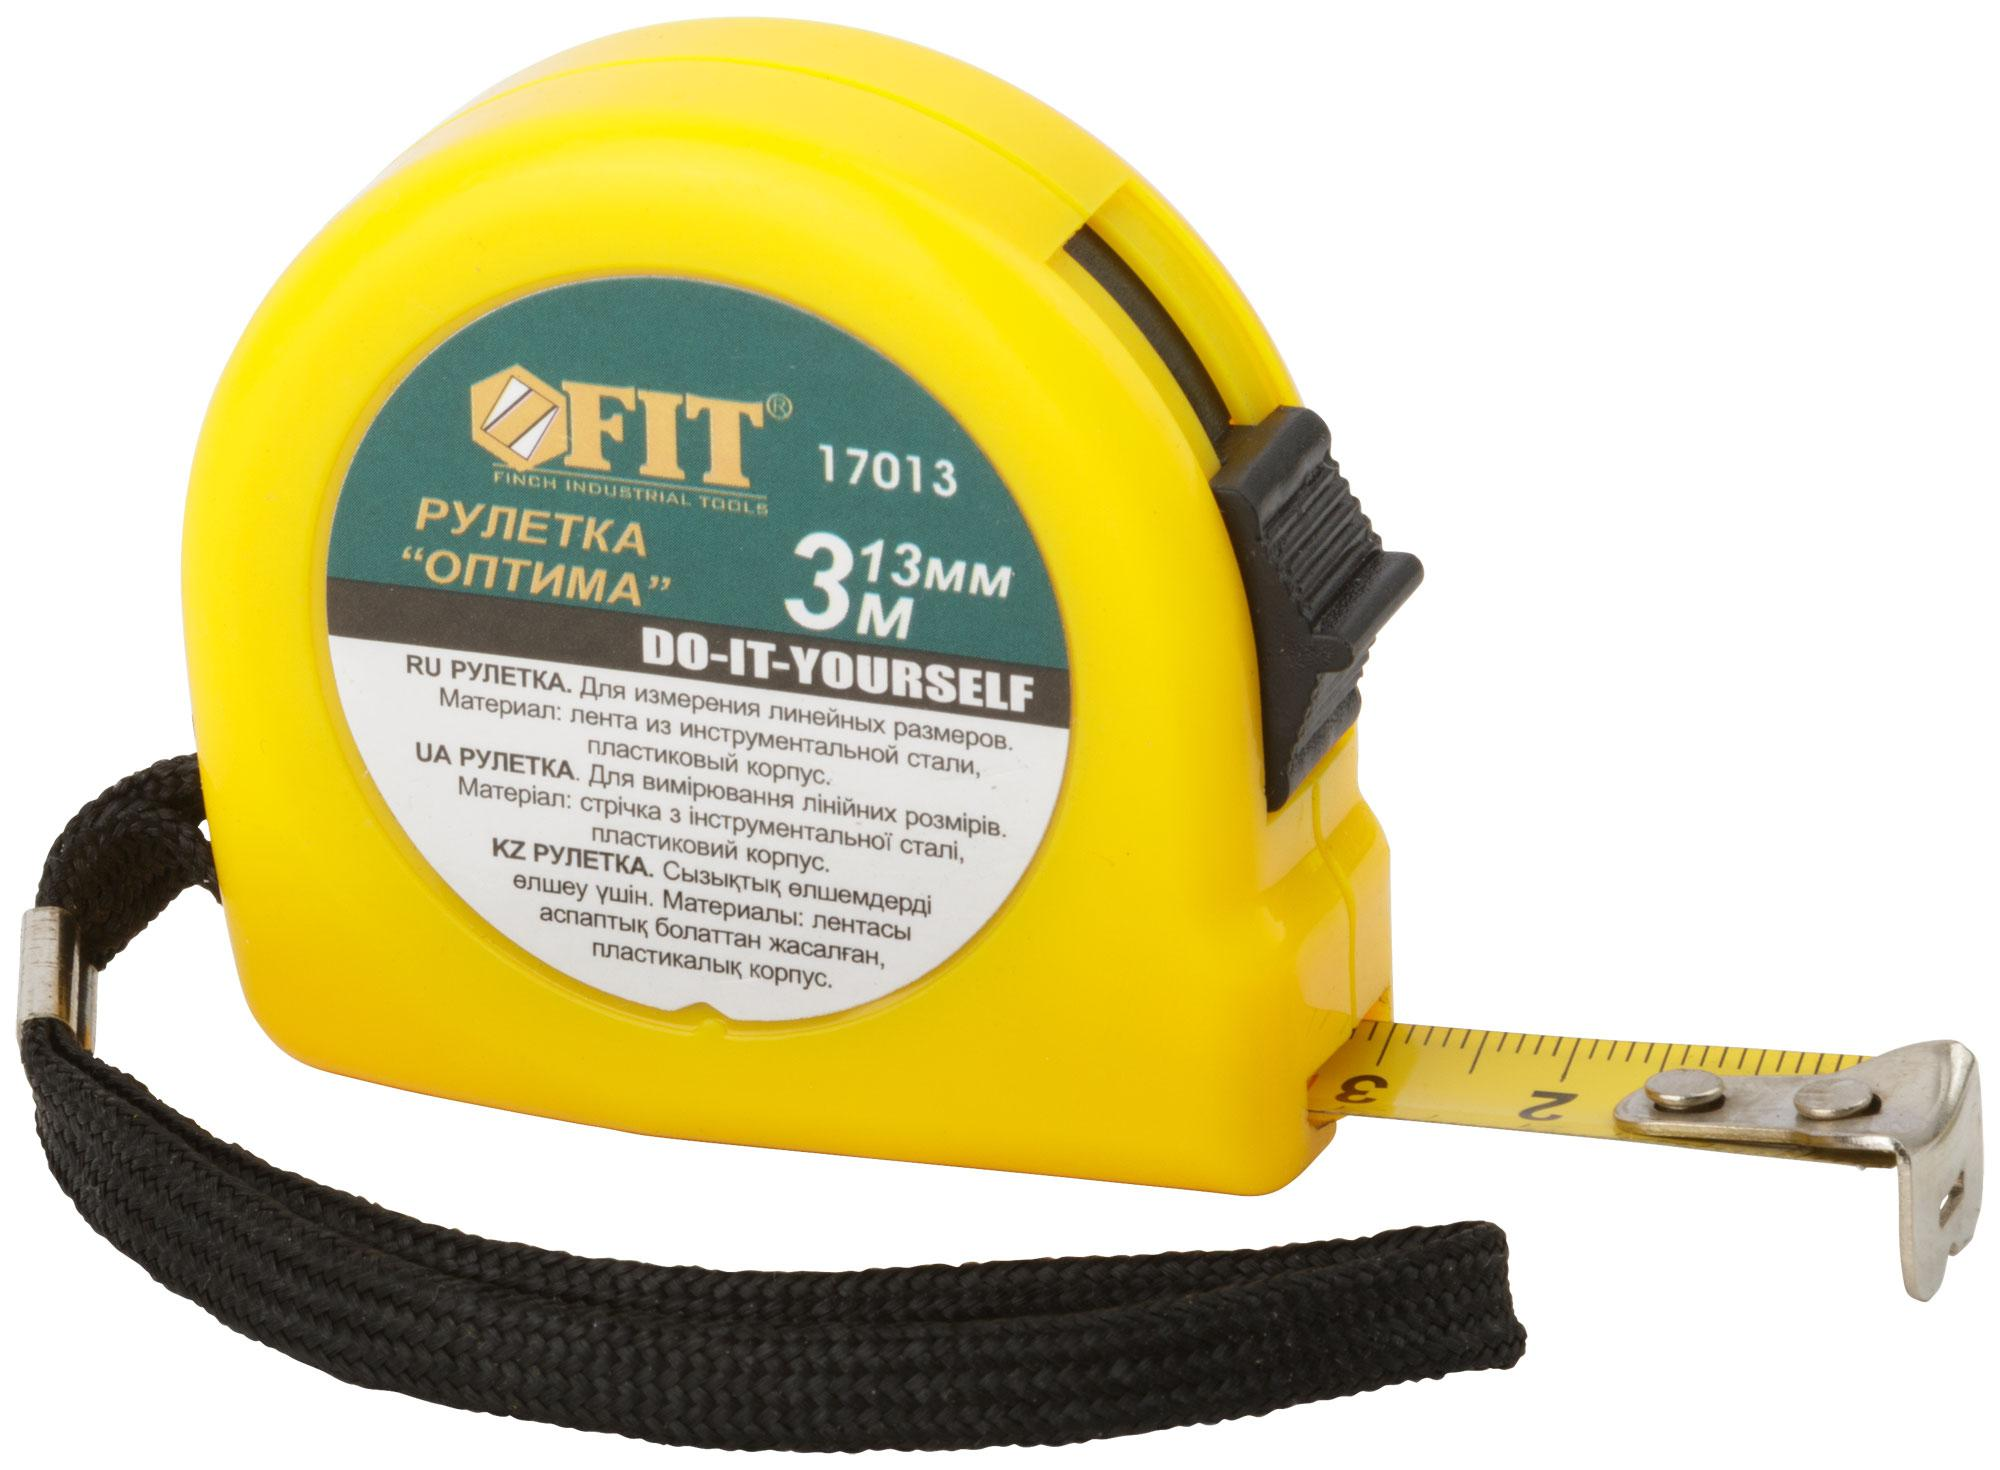 Рулетка Fit 17013